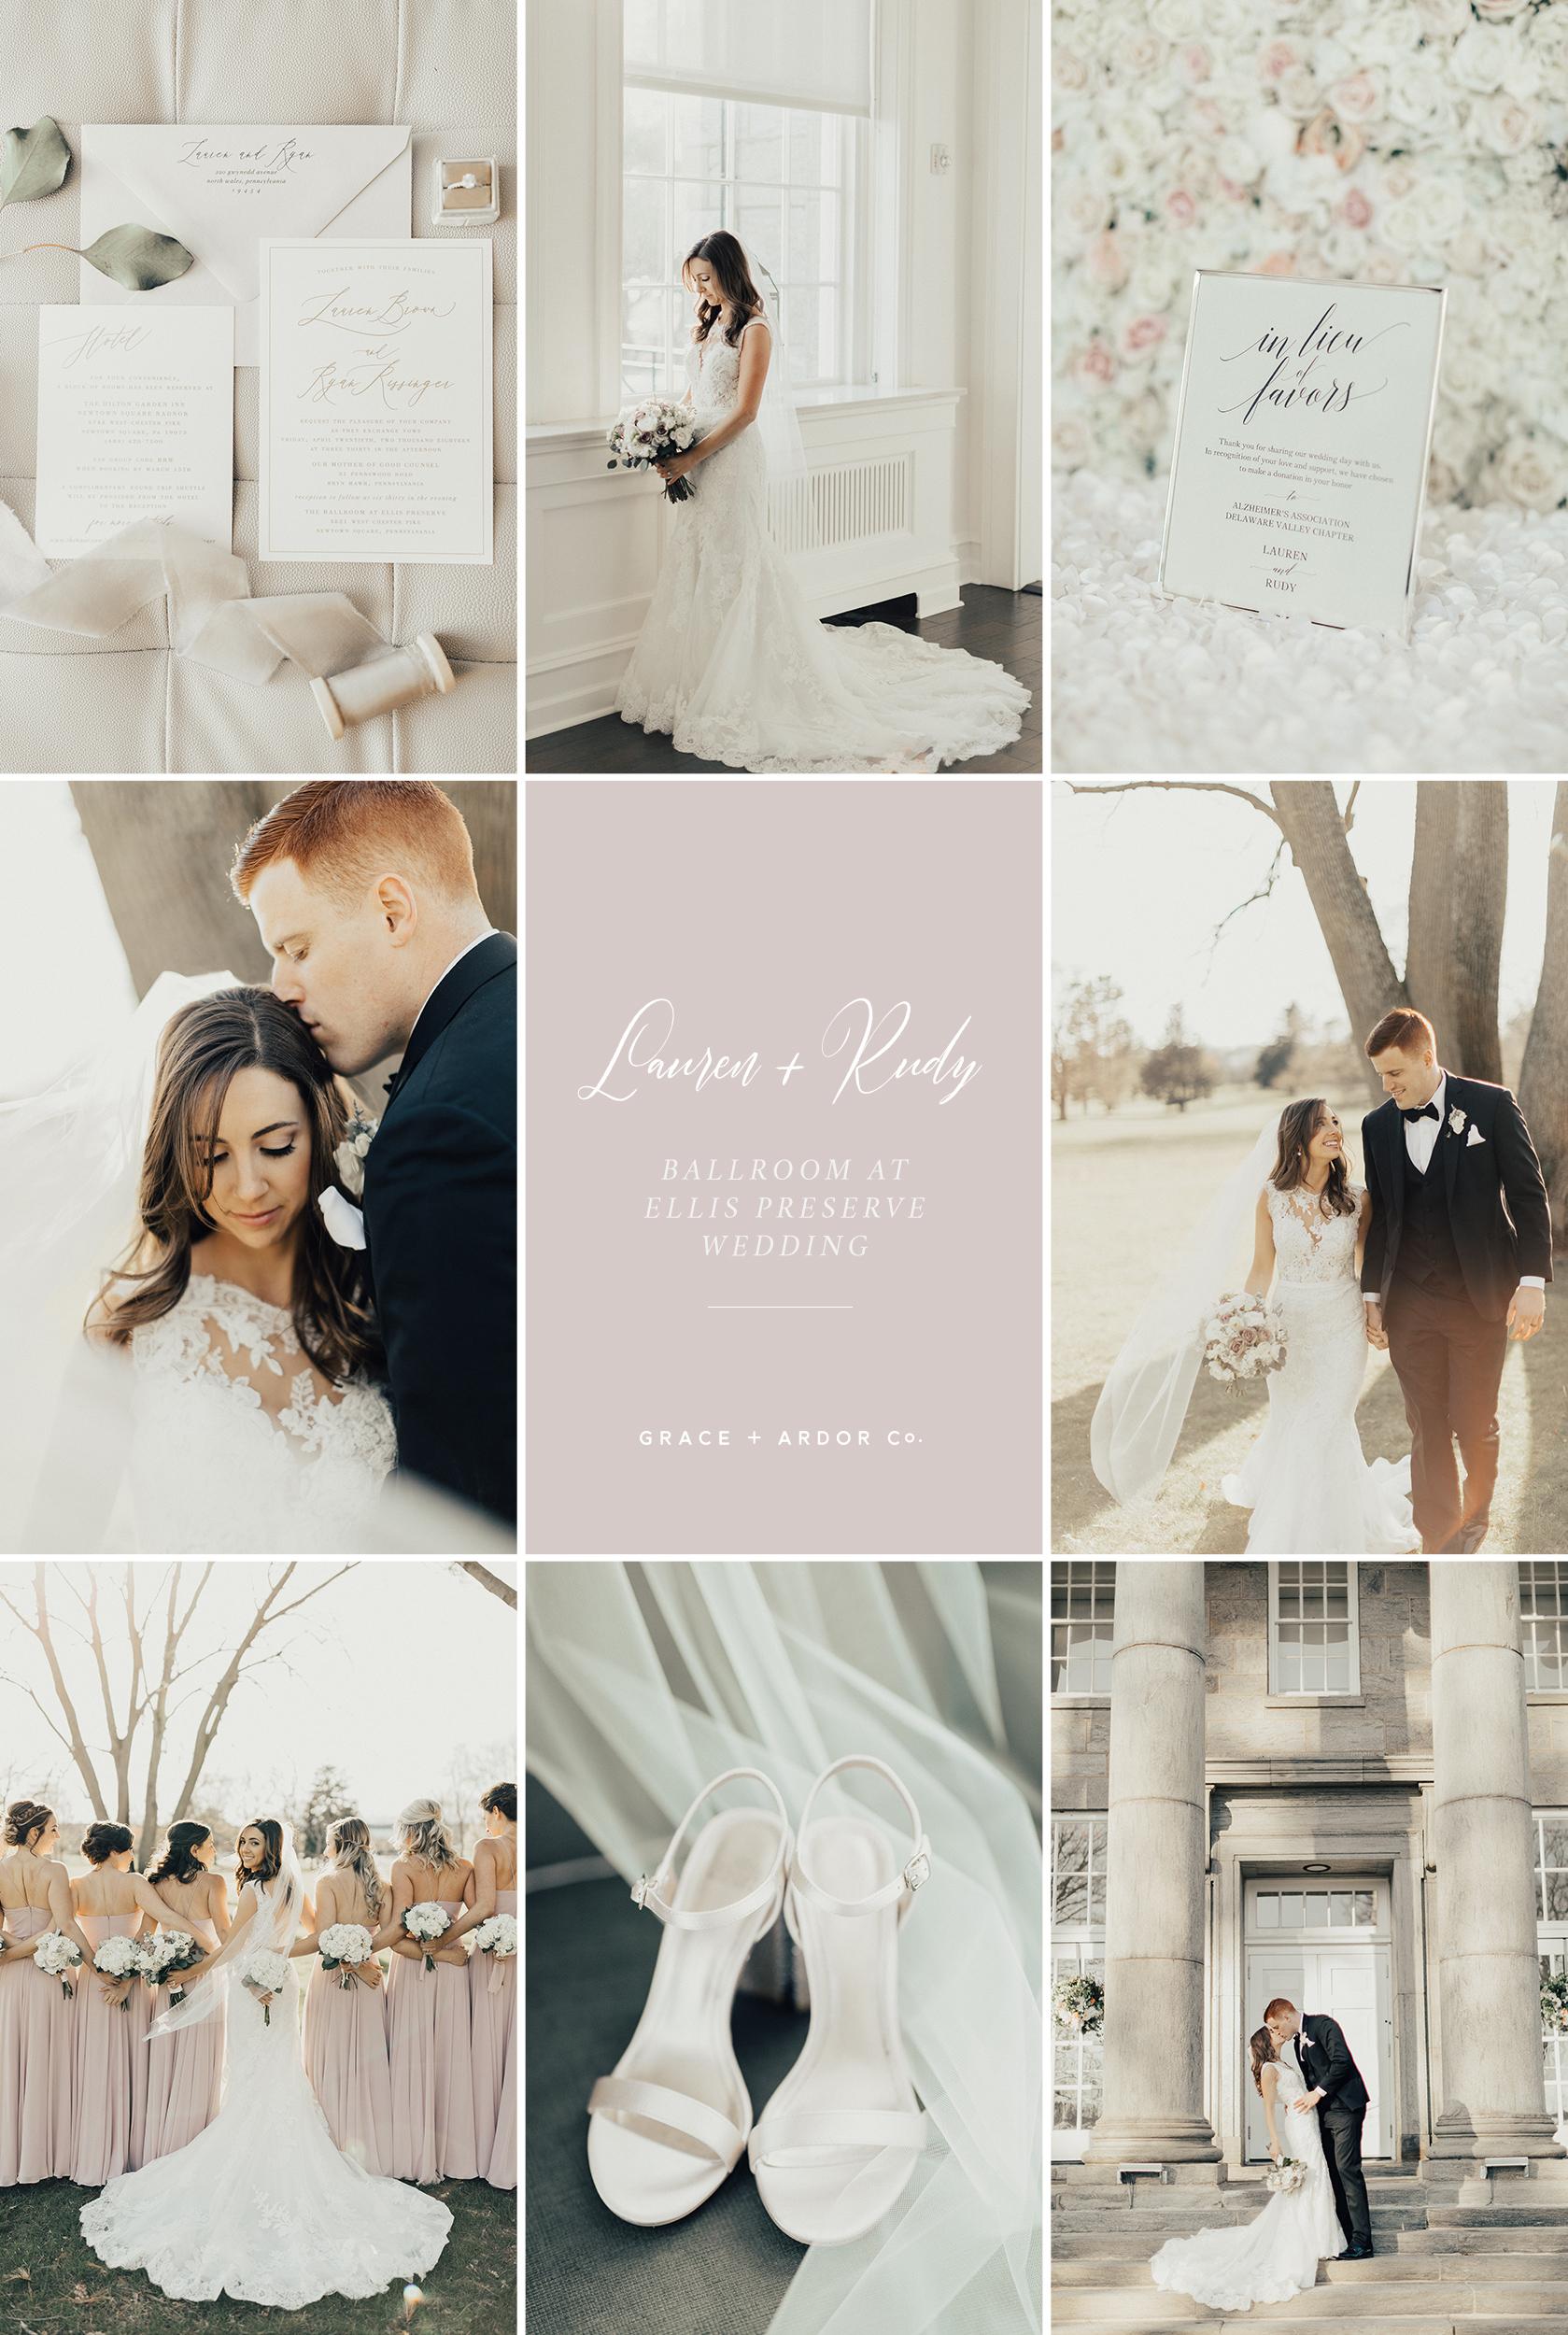 lauren-rudy-ballroom-ellis-preserve-wedding-grid.jpg